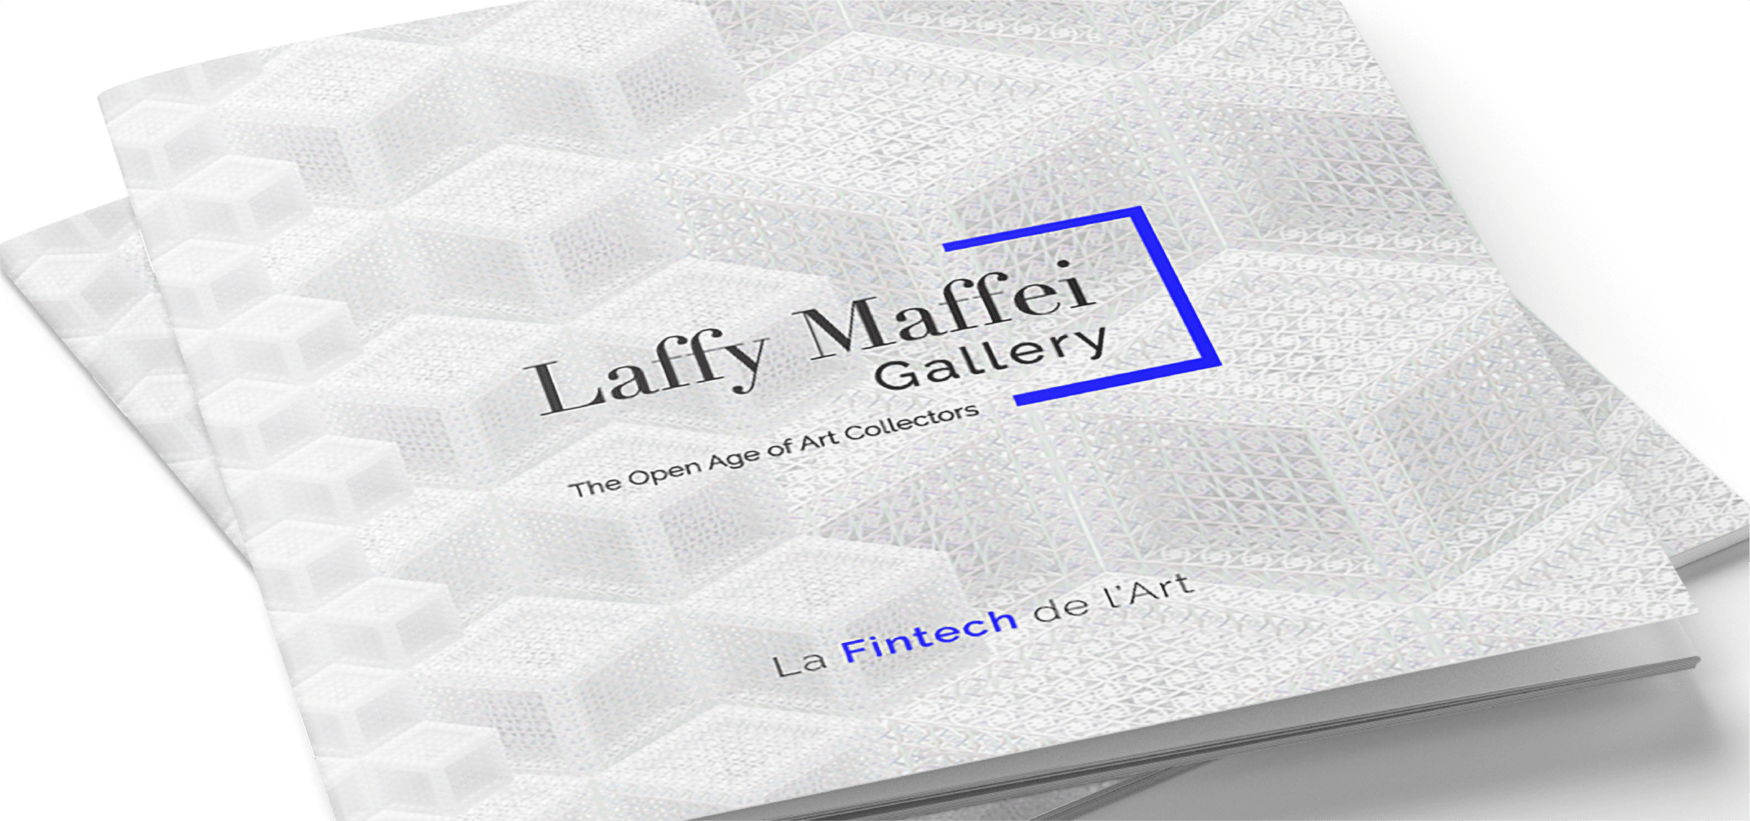 Création de l'agence Cassian pour Laffy Maffei Gallery